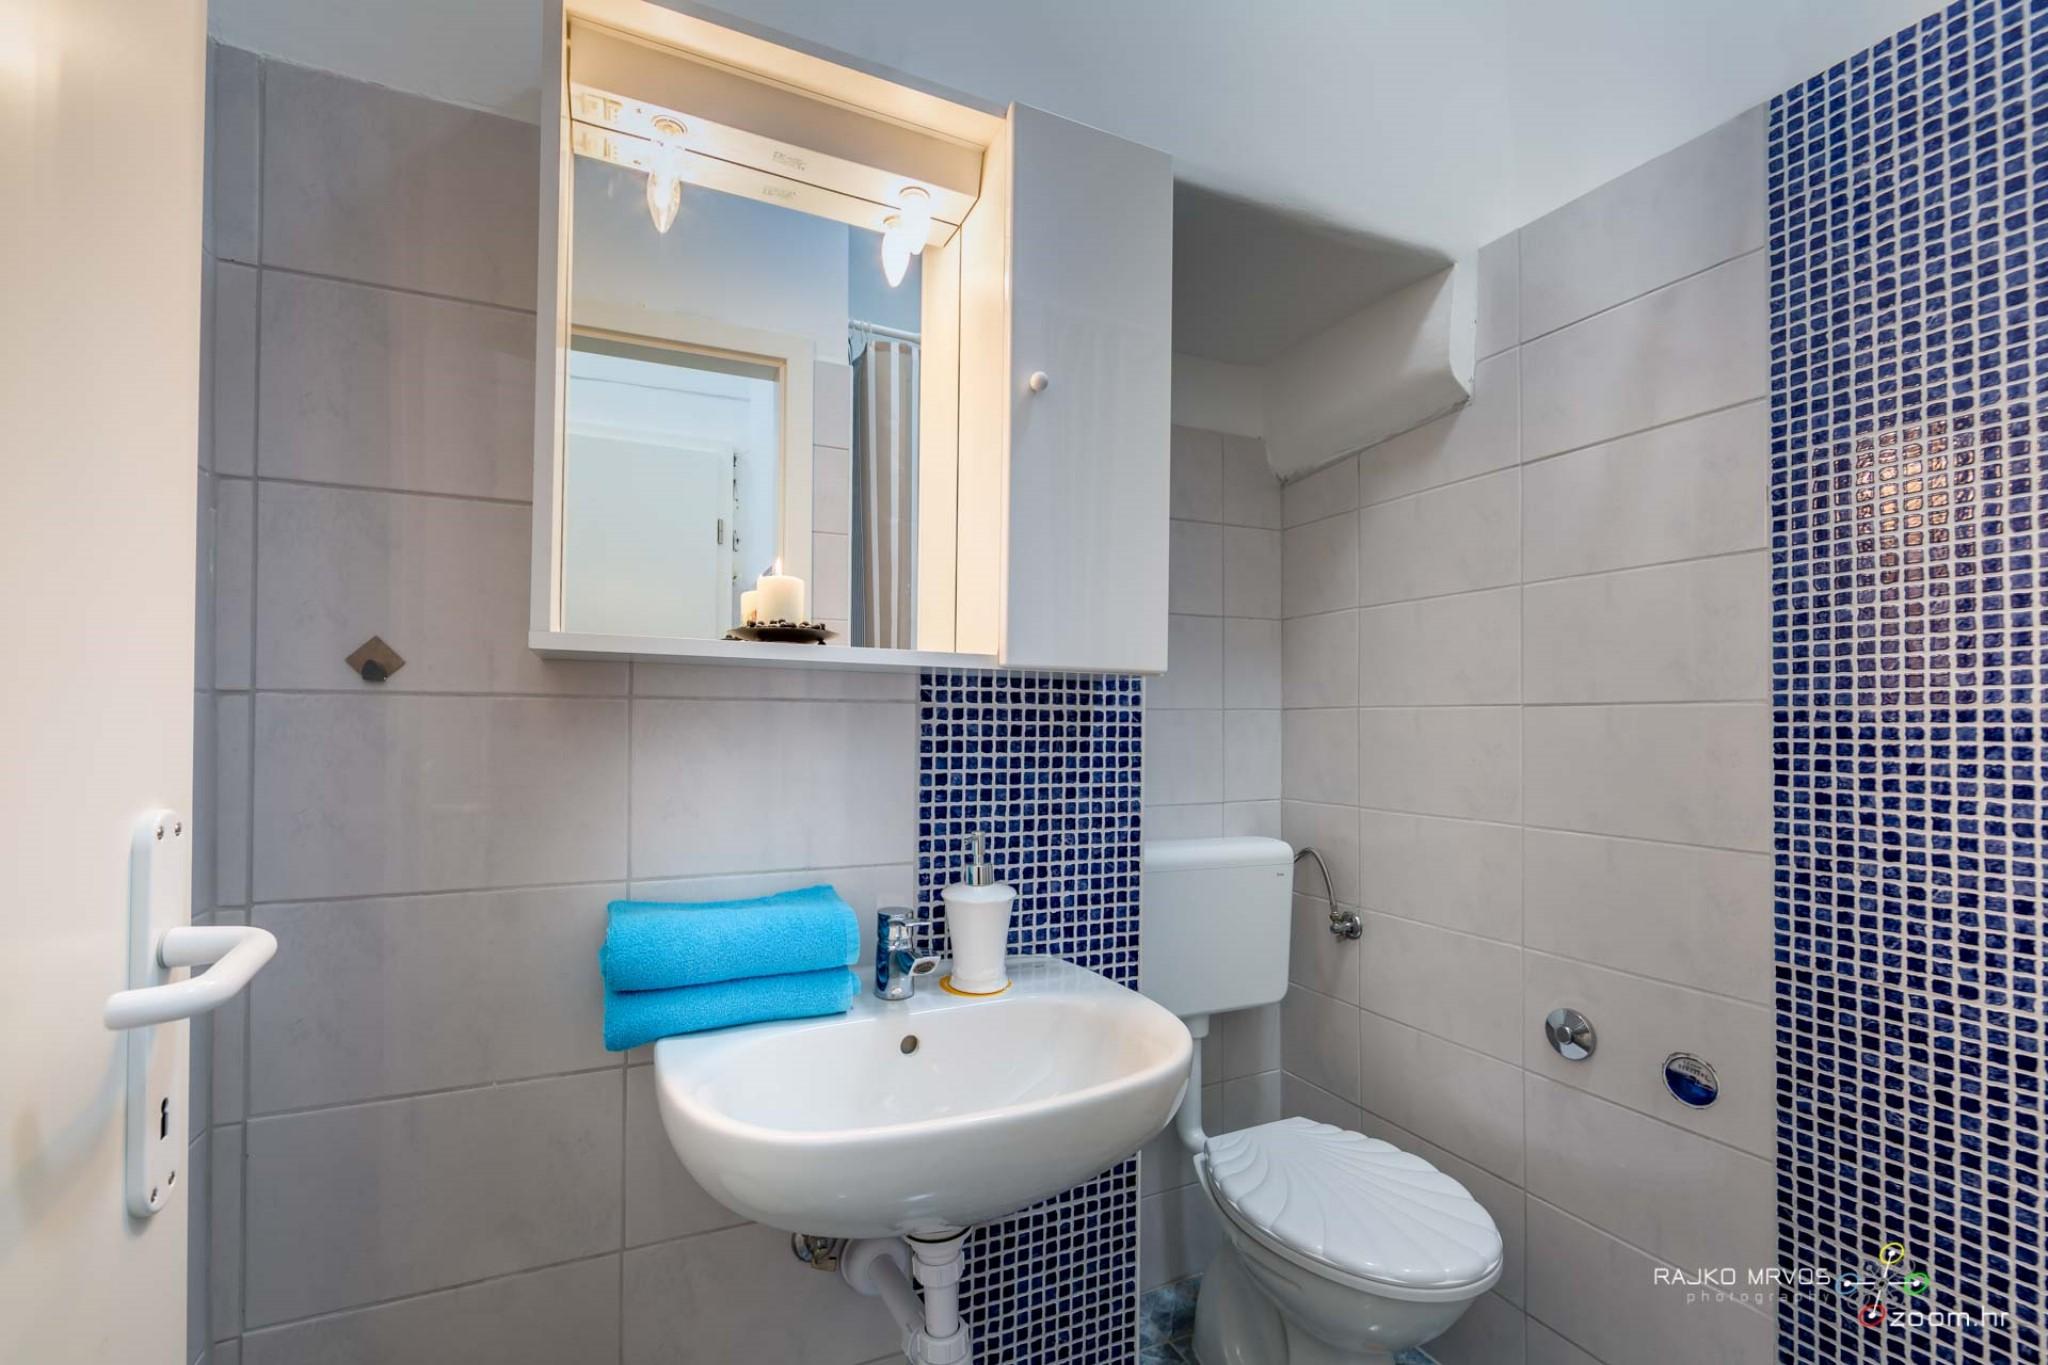 fotografiranje-interijera-fotograf-eksterijera-apartmana-vila-kuca-hostela-Happy-Hostel-11